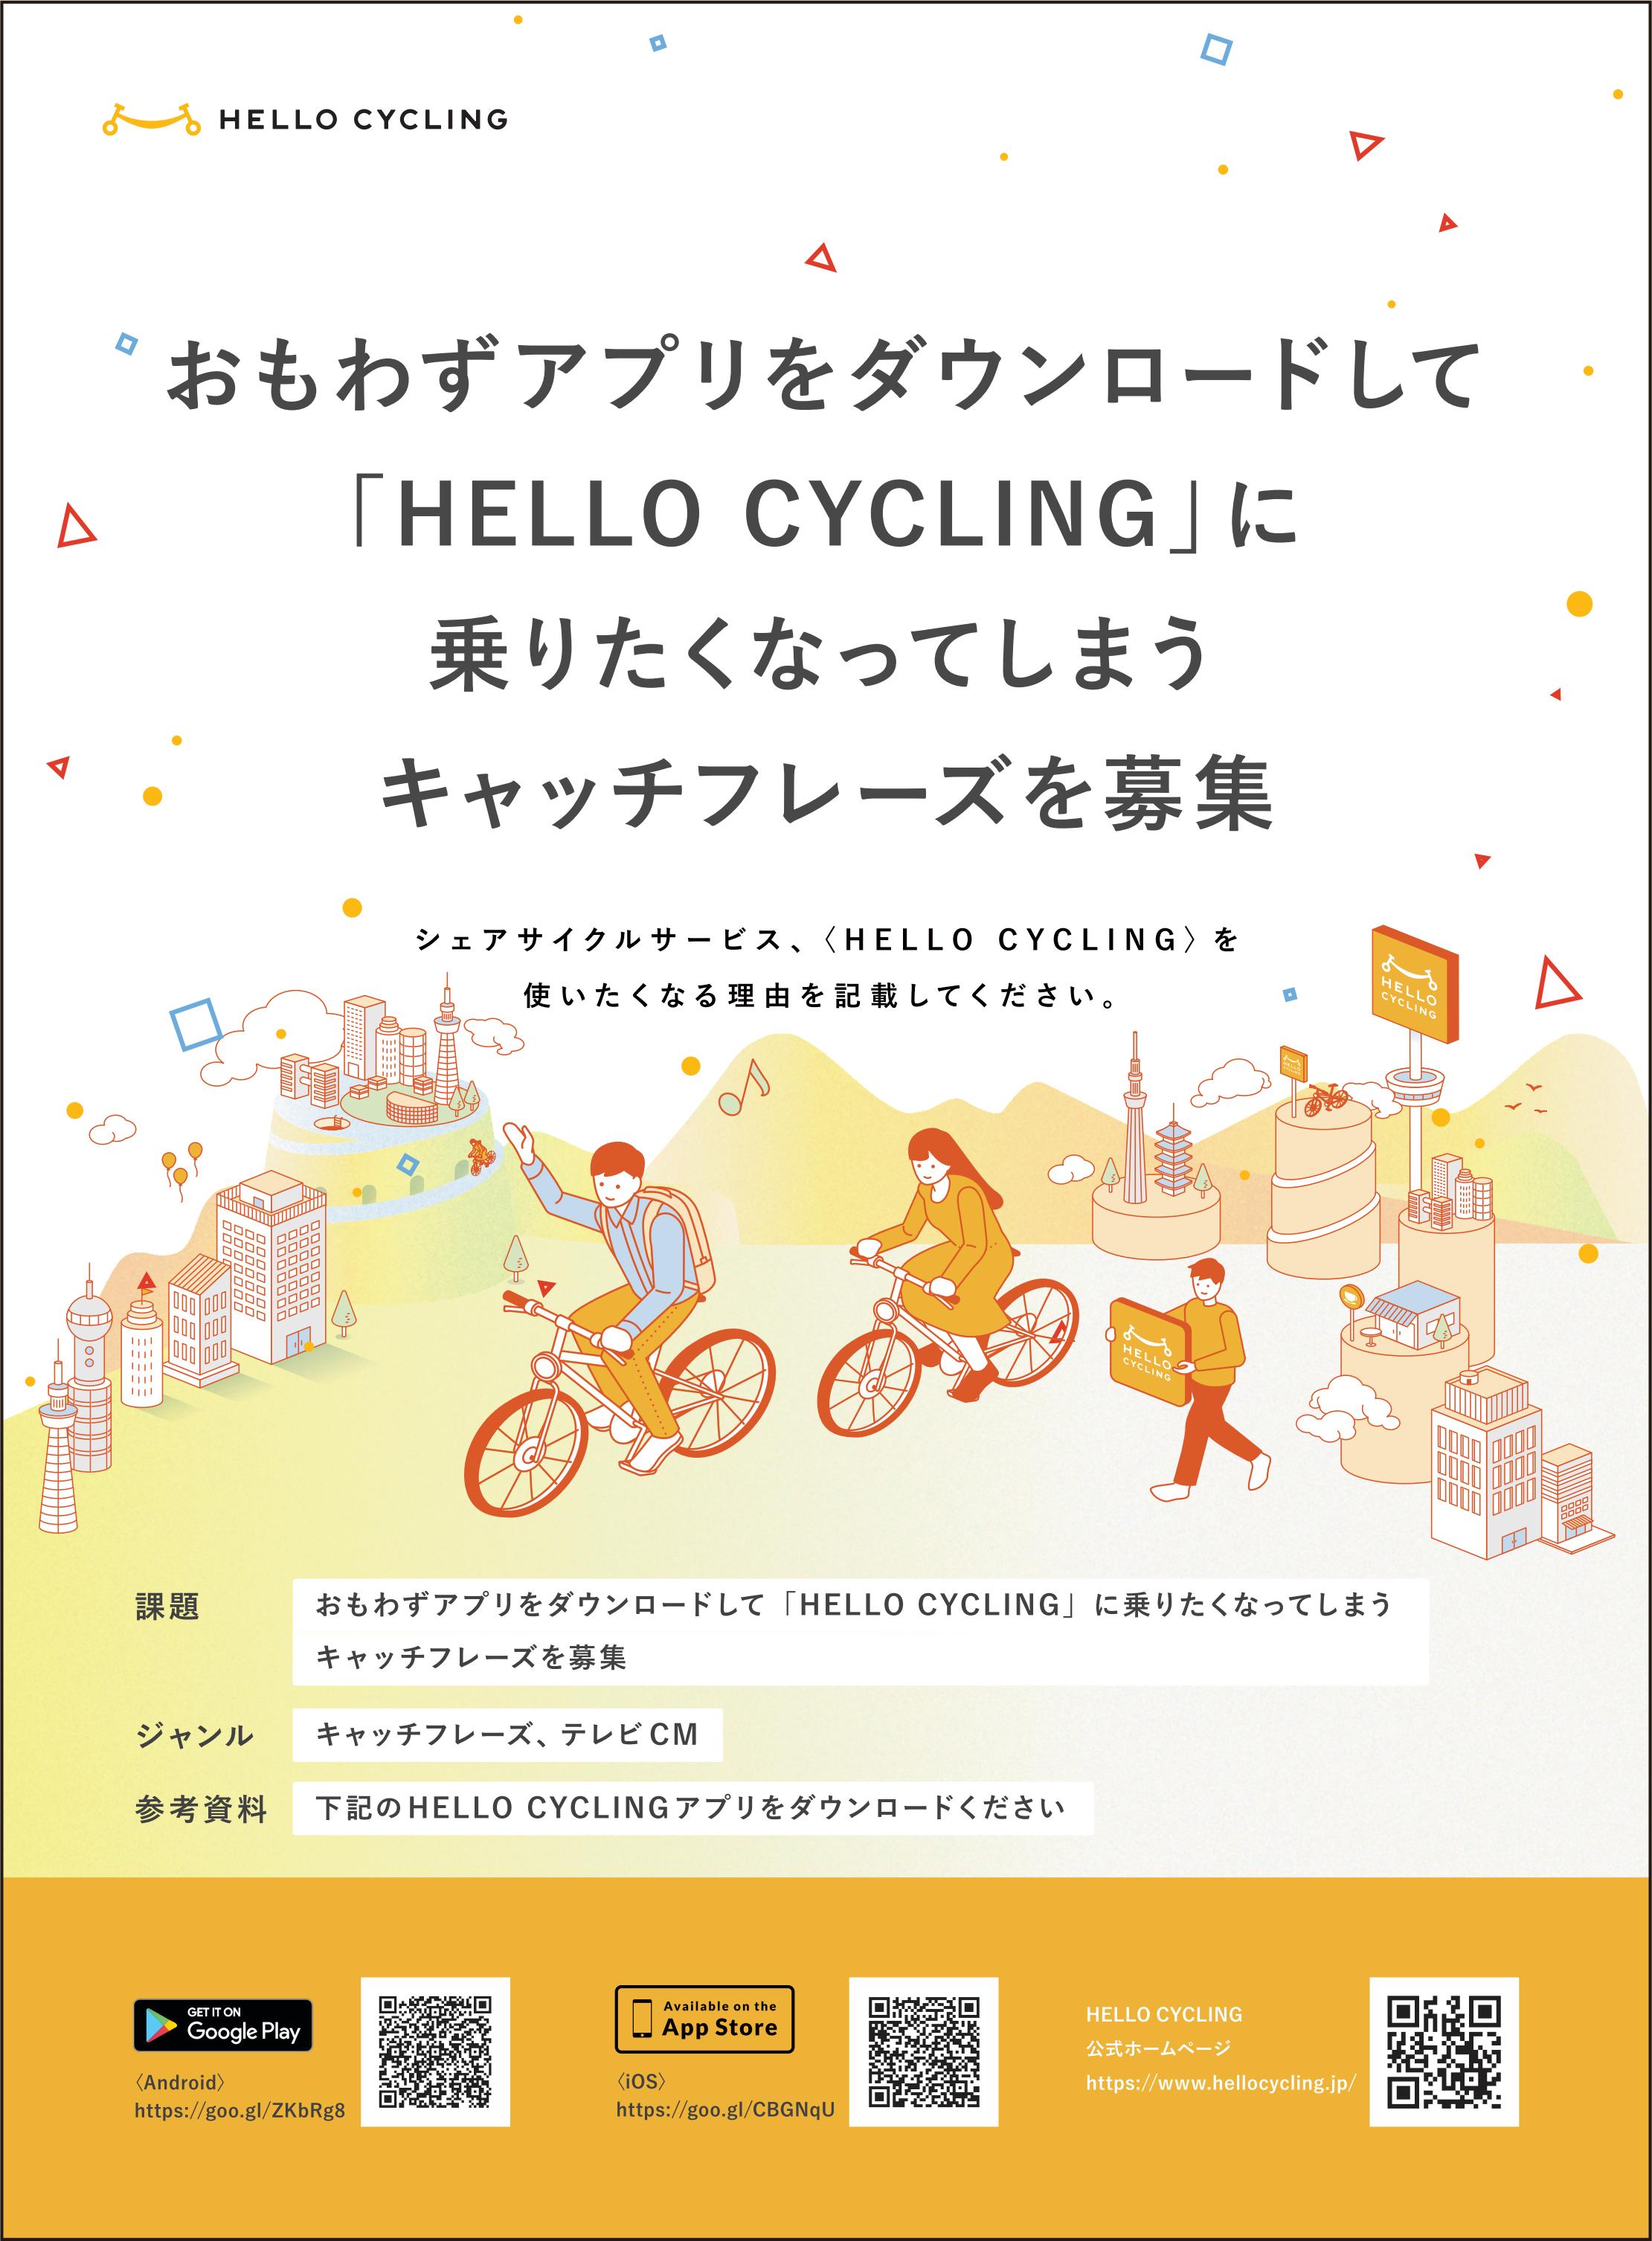 02.OpenStreet (HELLO CYCLING)